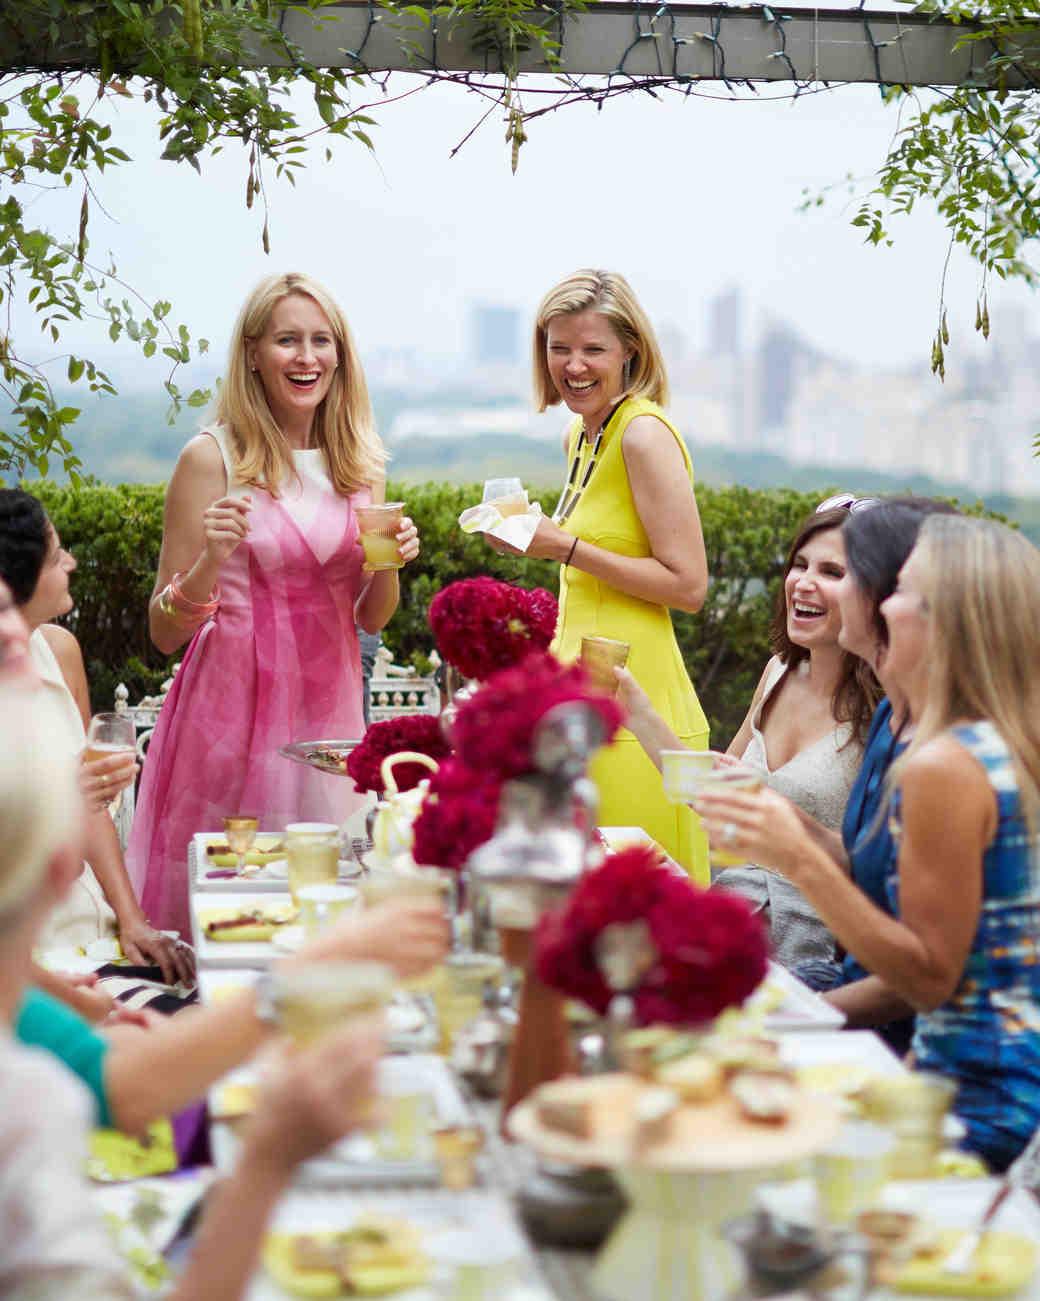 lela-rose-pret-a-party-book-launch-tea-quila-women-laughing-0915.jpg